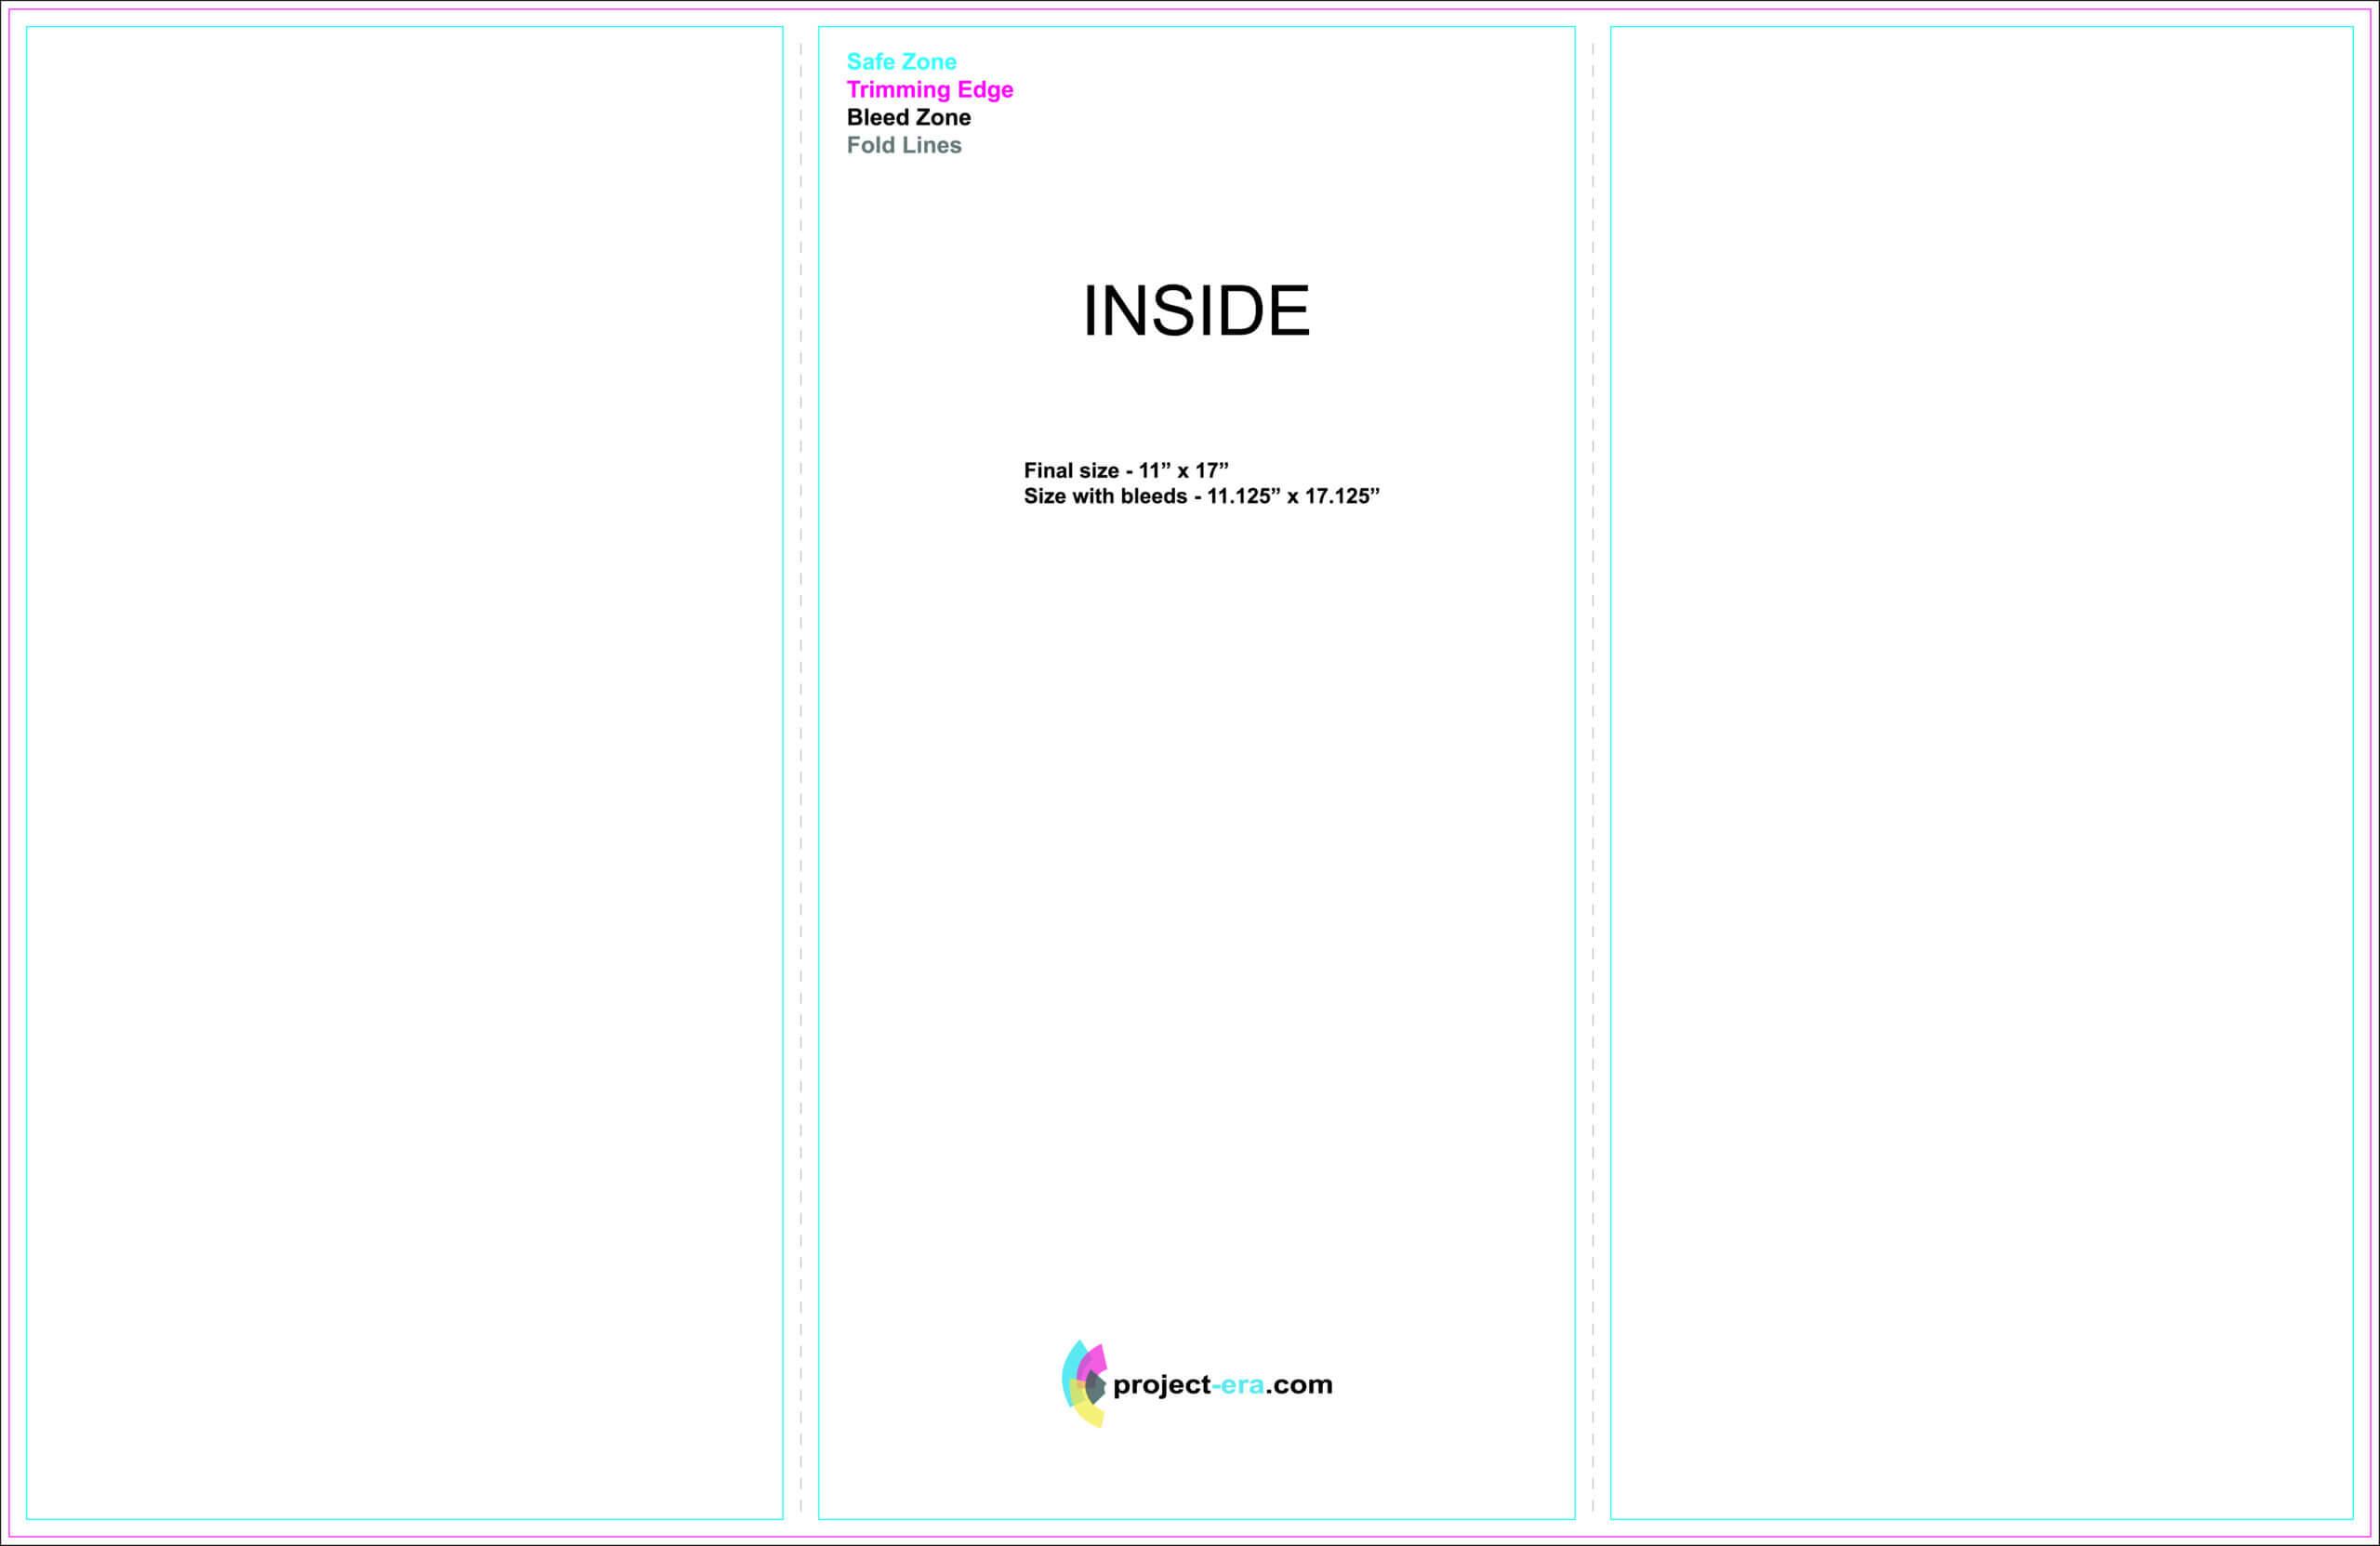 Tri Fold Brochure Template Illustrator - Calep.midnightpig.co Throughout Tri Fold Brochure Template Illustrator